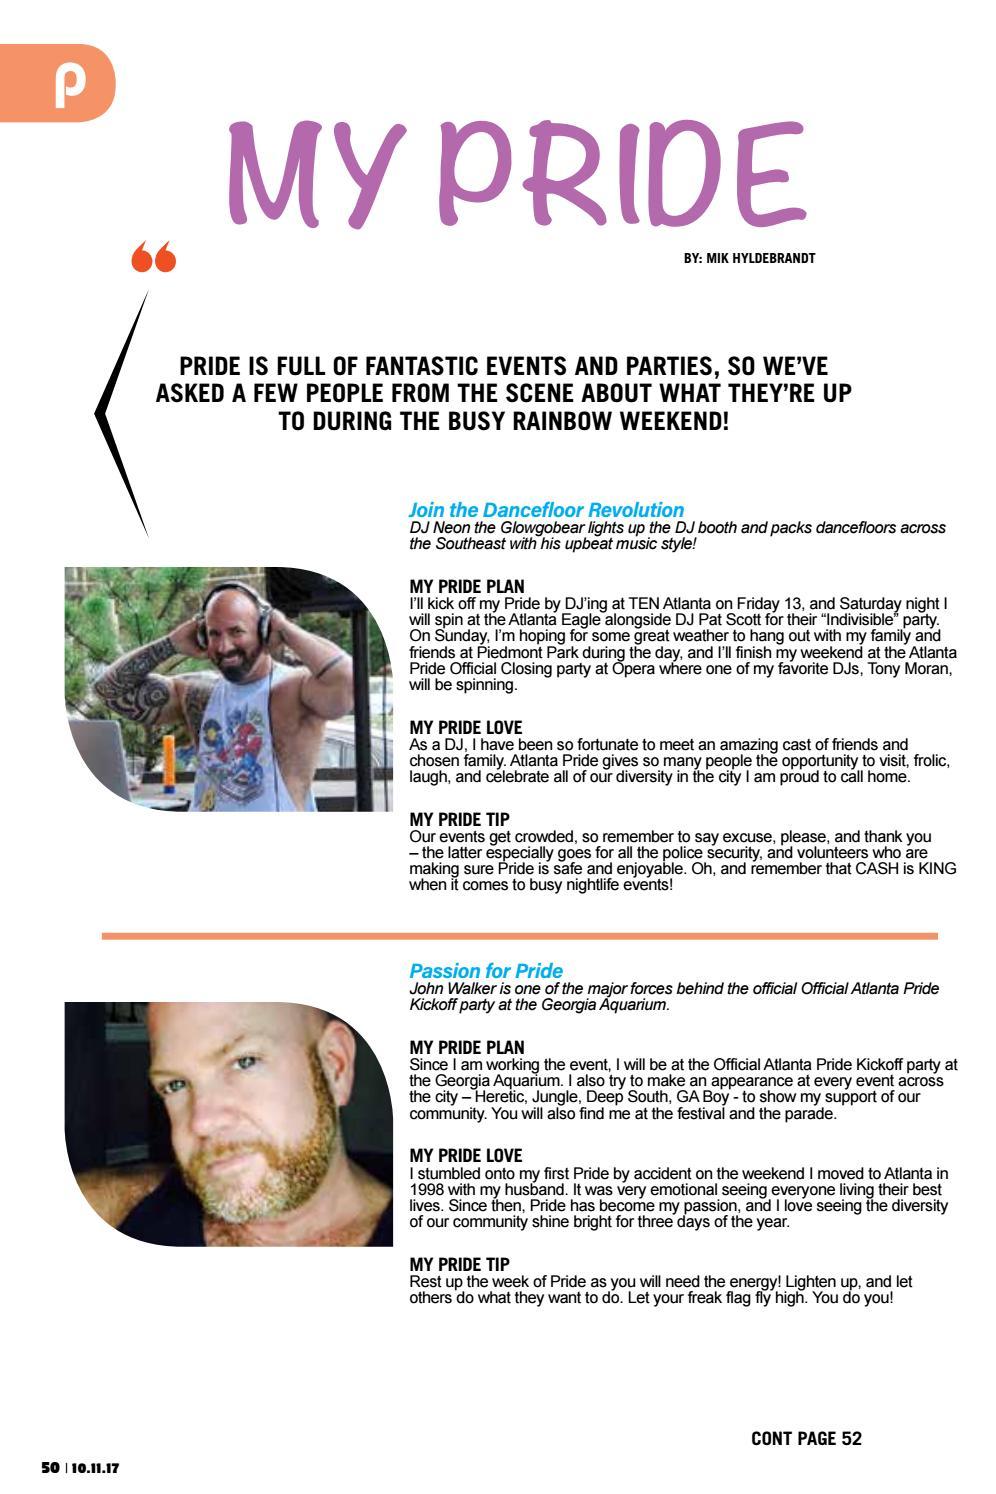 Peach Atl - Magazine Issue 14 by Peach Atlanta Magazine - issuu